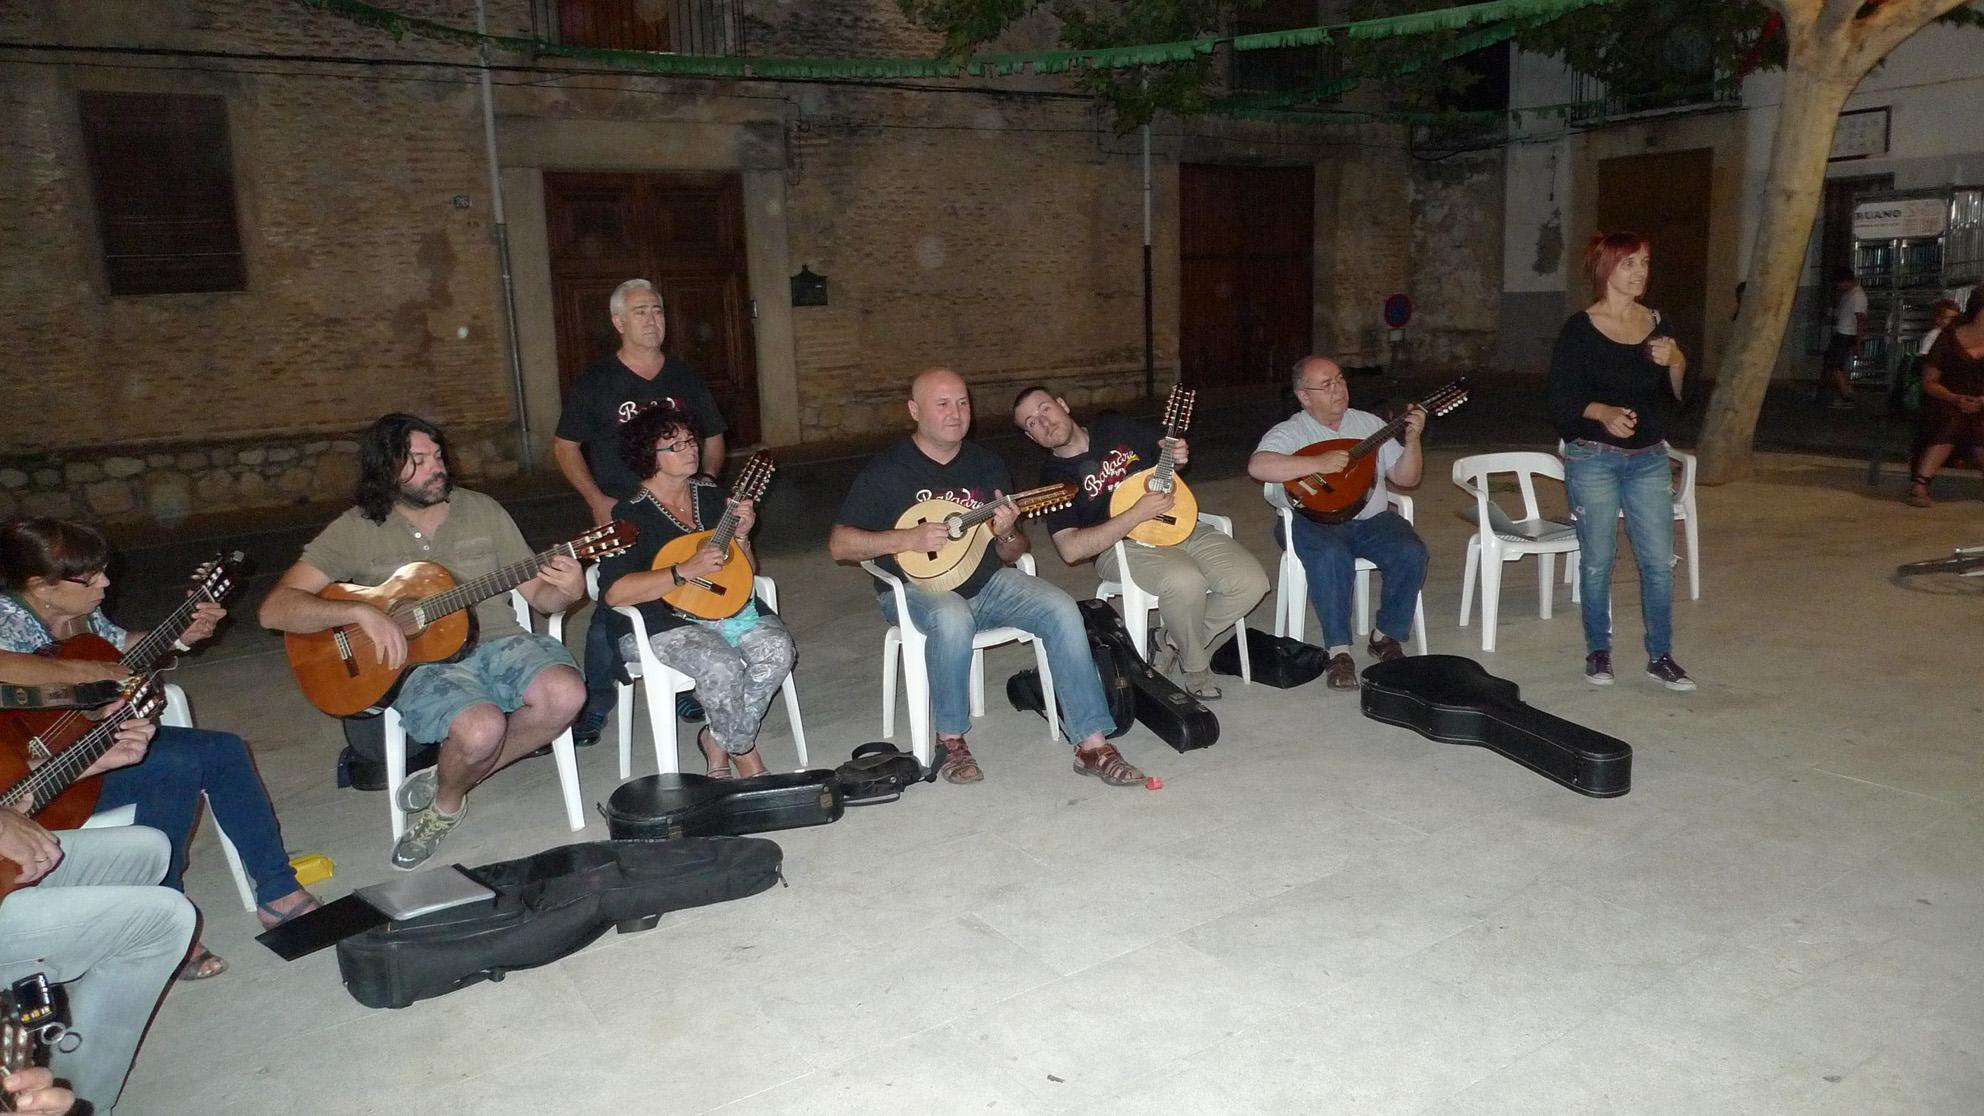 2014-07-20 PalacioDansetesPalacio i Albaes (113)